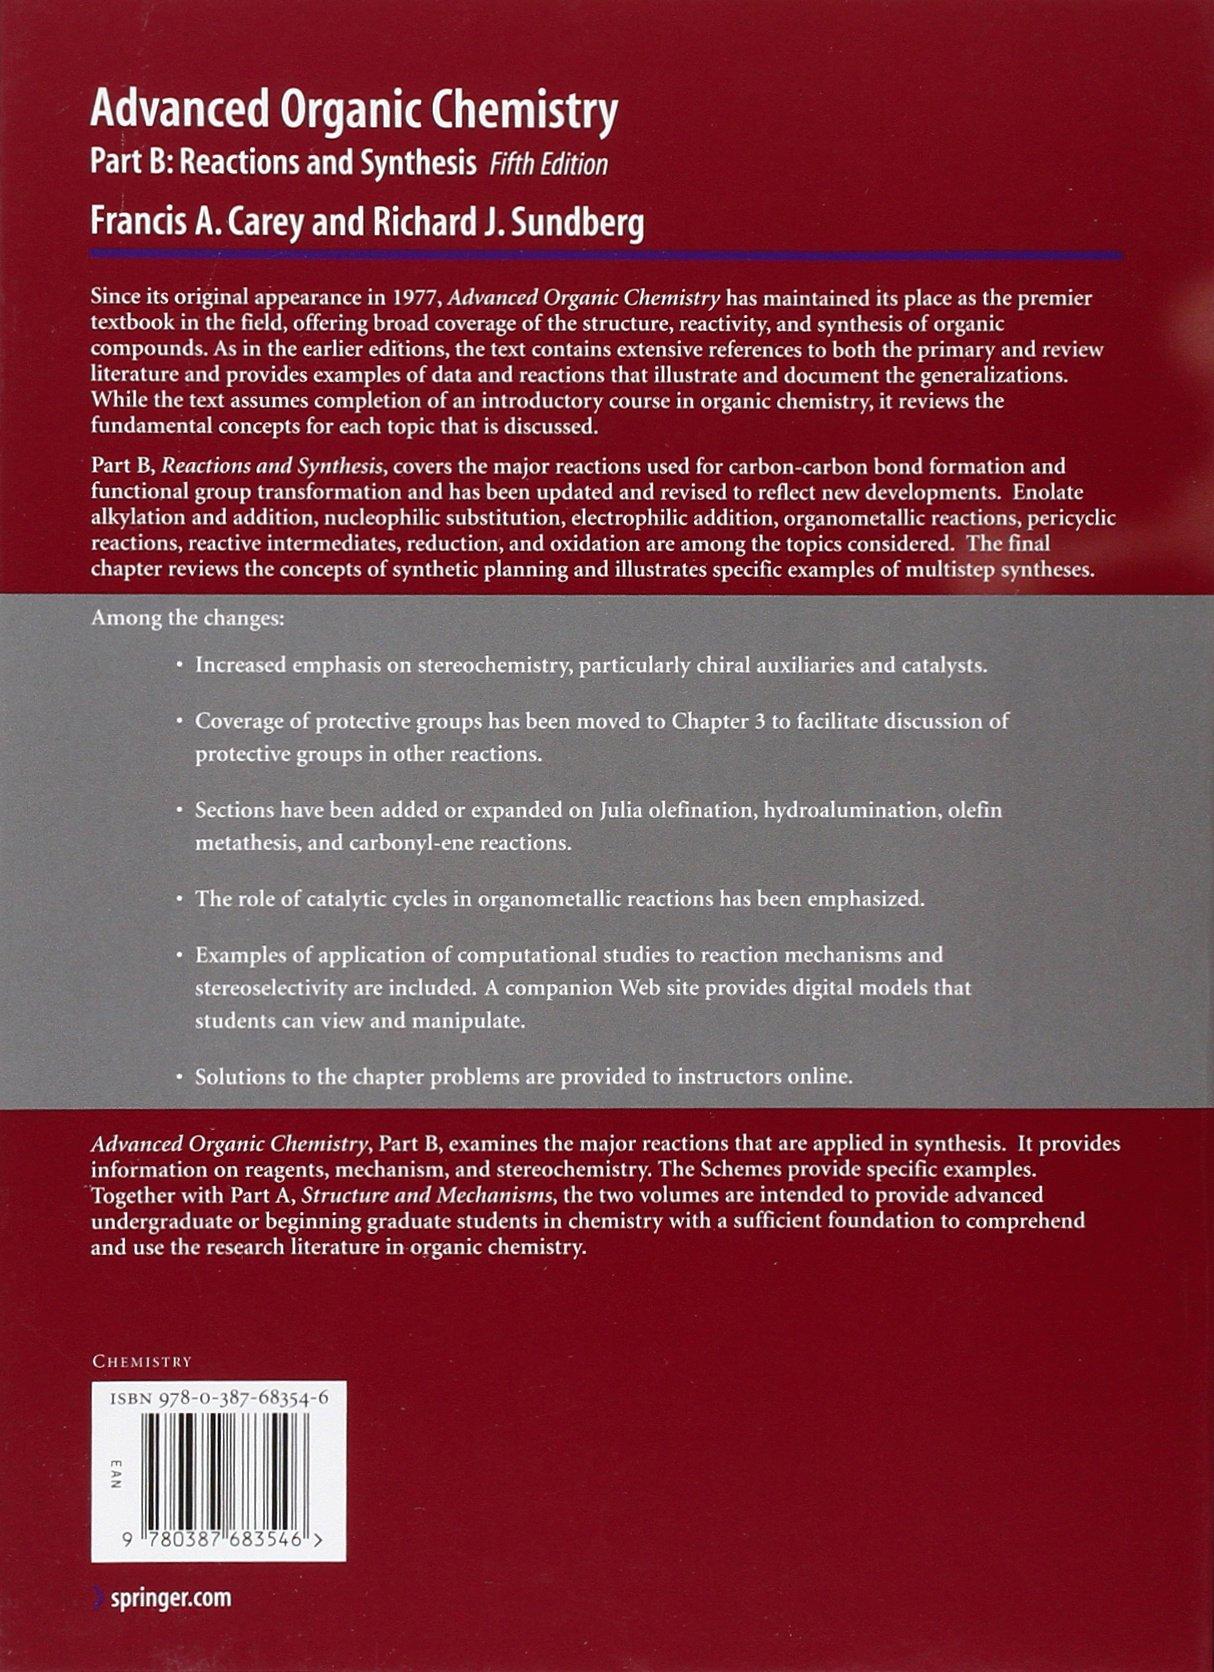 Advanced Organic Chemistry: Part B: Reaction and Synthesis: Francis A.  Carey, Richard J. Sundberg: 9780387683546: Books - Amazon.ca